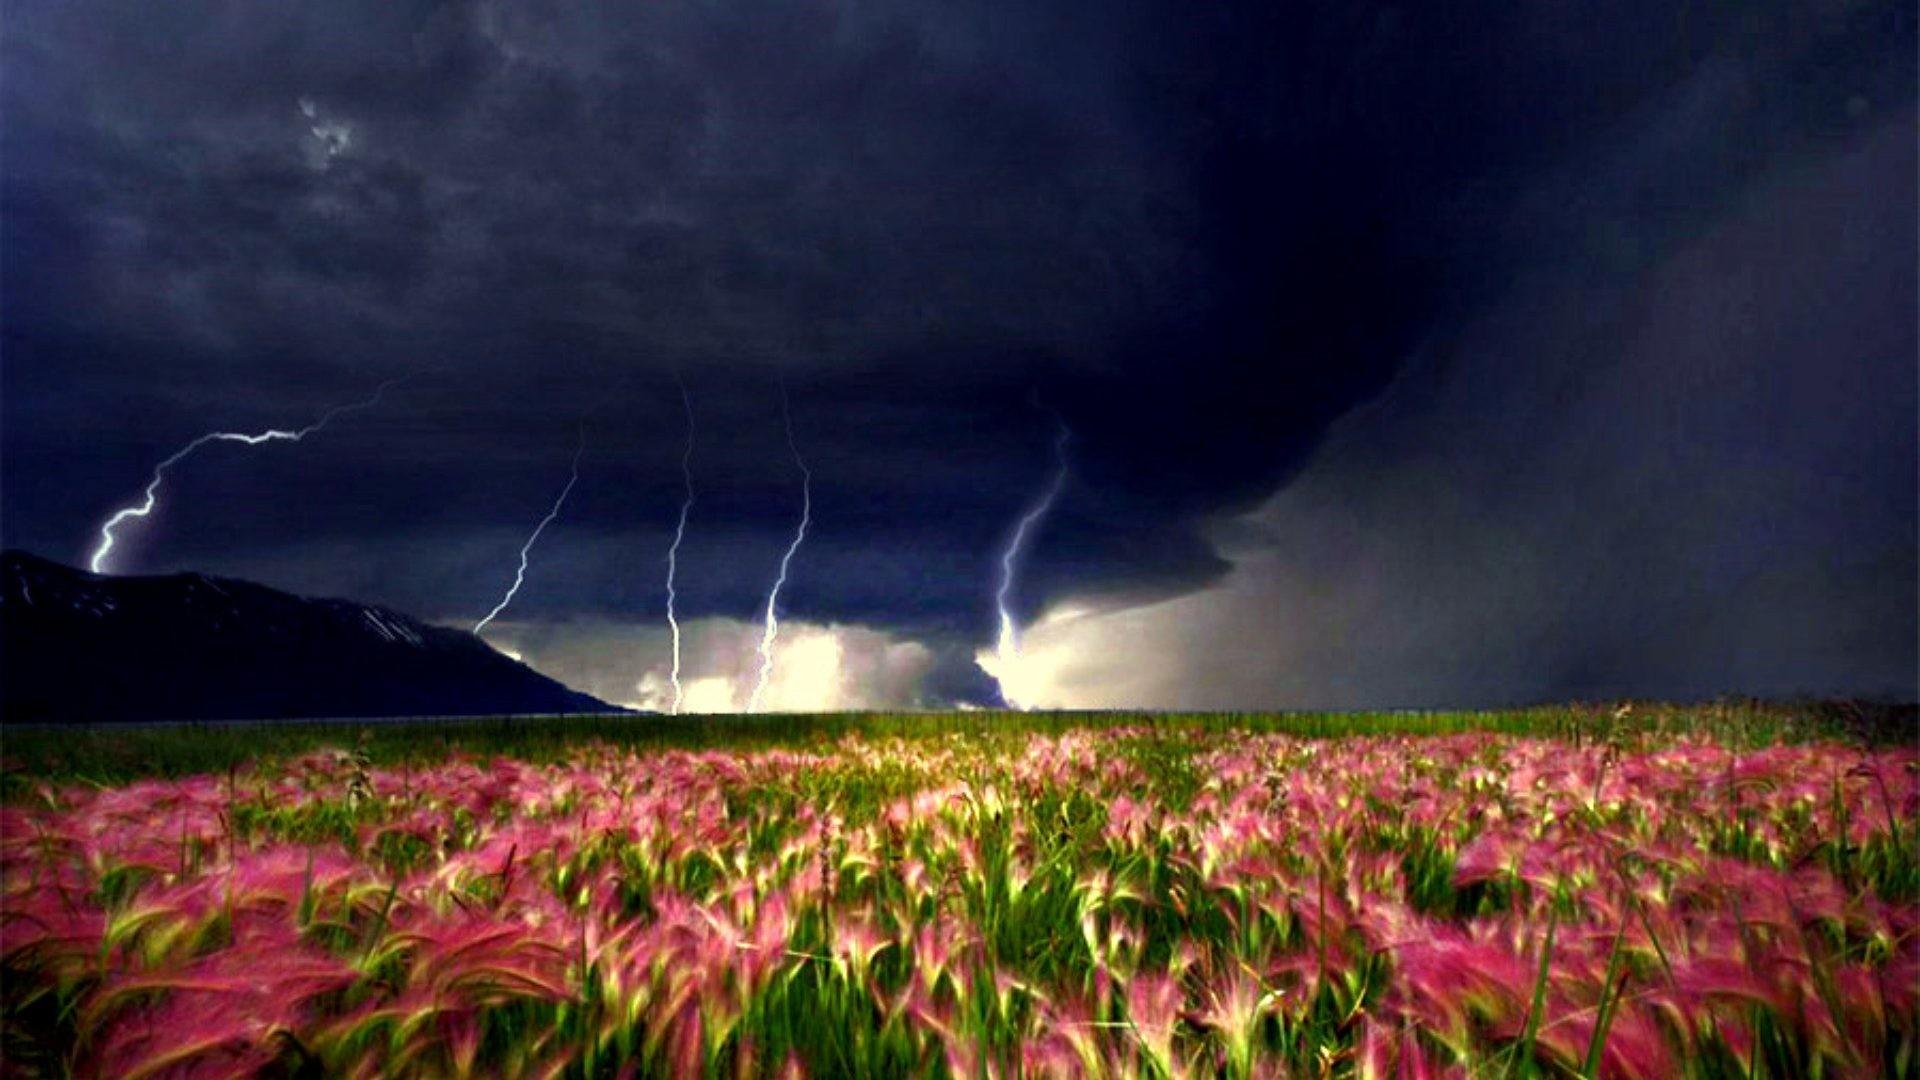 Storm Field Rain Clouds Stormy Moving Tornado Closer Weather Flowers Desktop  Nature Backgrounds Detail